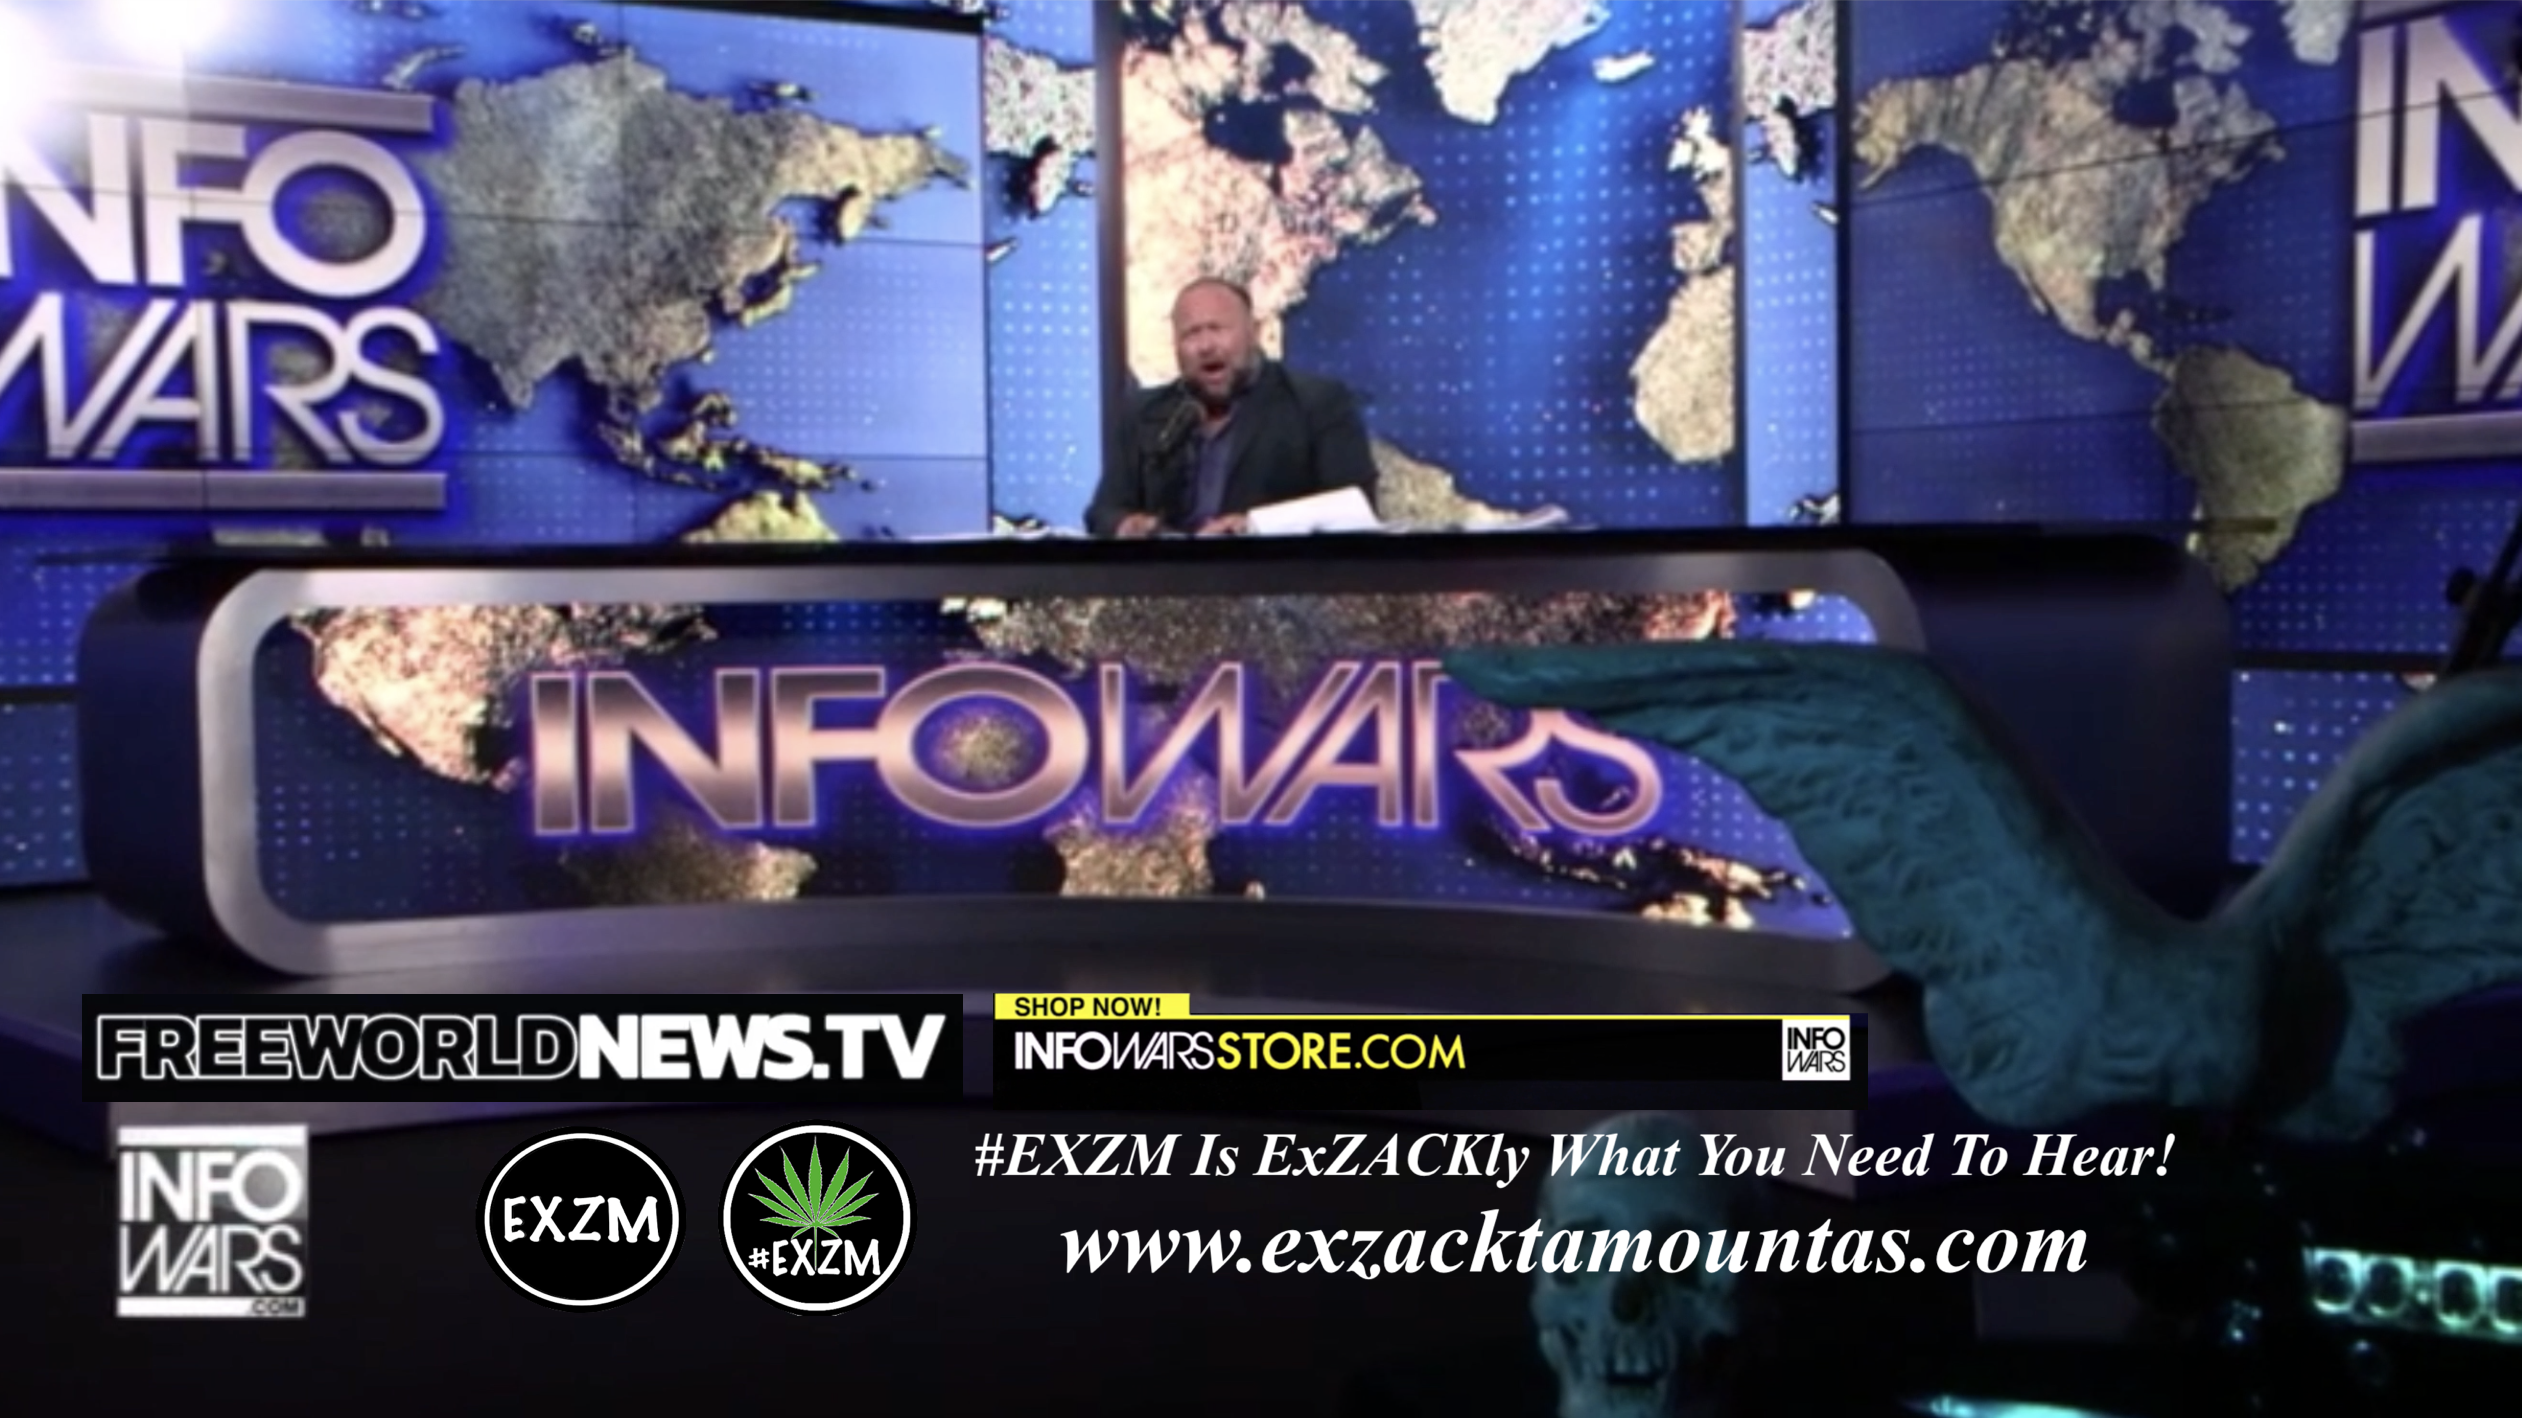 Alex Jones Live In Infowars Studio Free World News TV EXZM Zack Mount August 29th 2021 copy